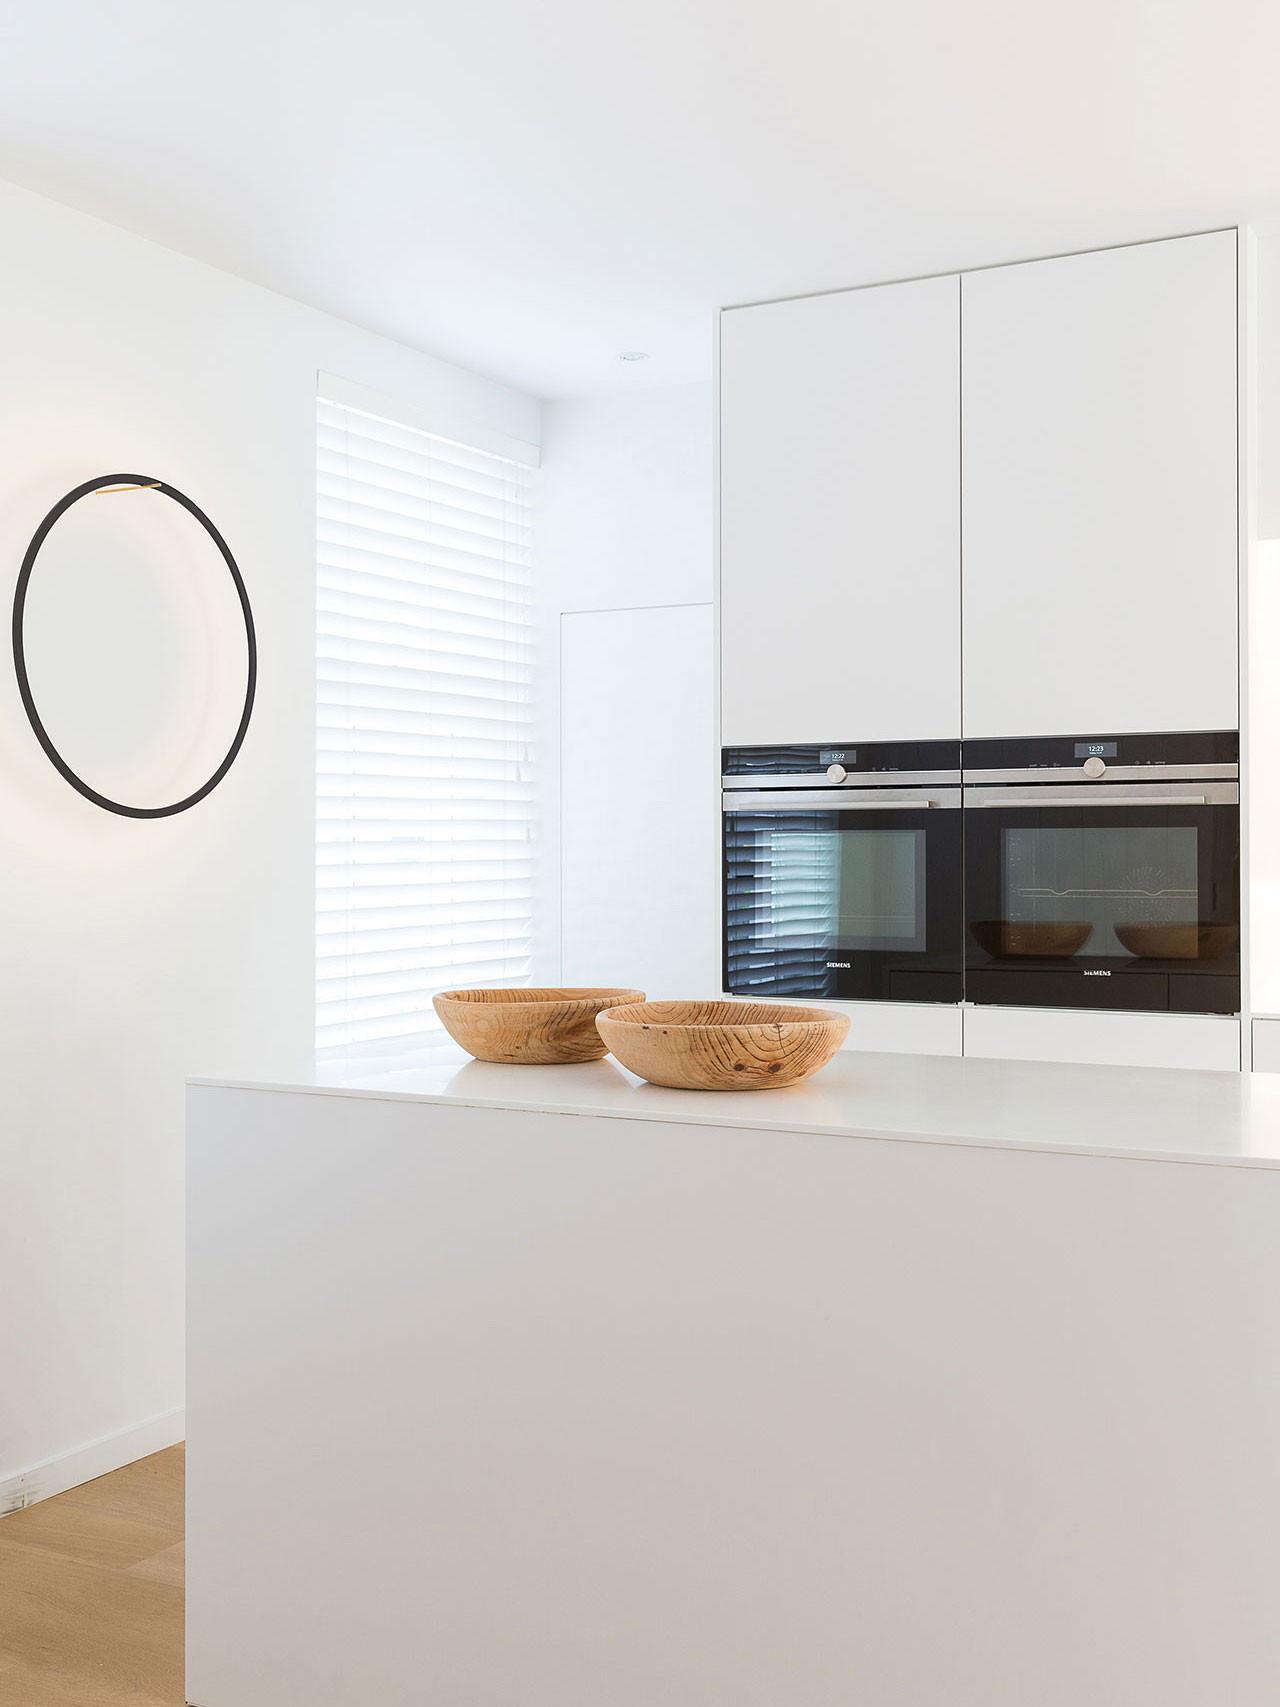 Dekeyzer-hedendaagse-keuken-satijnlak-wit-corian-6.jpg